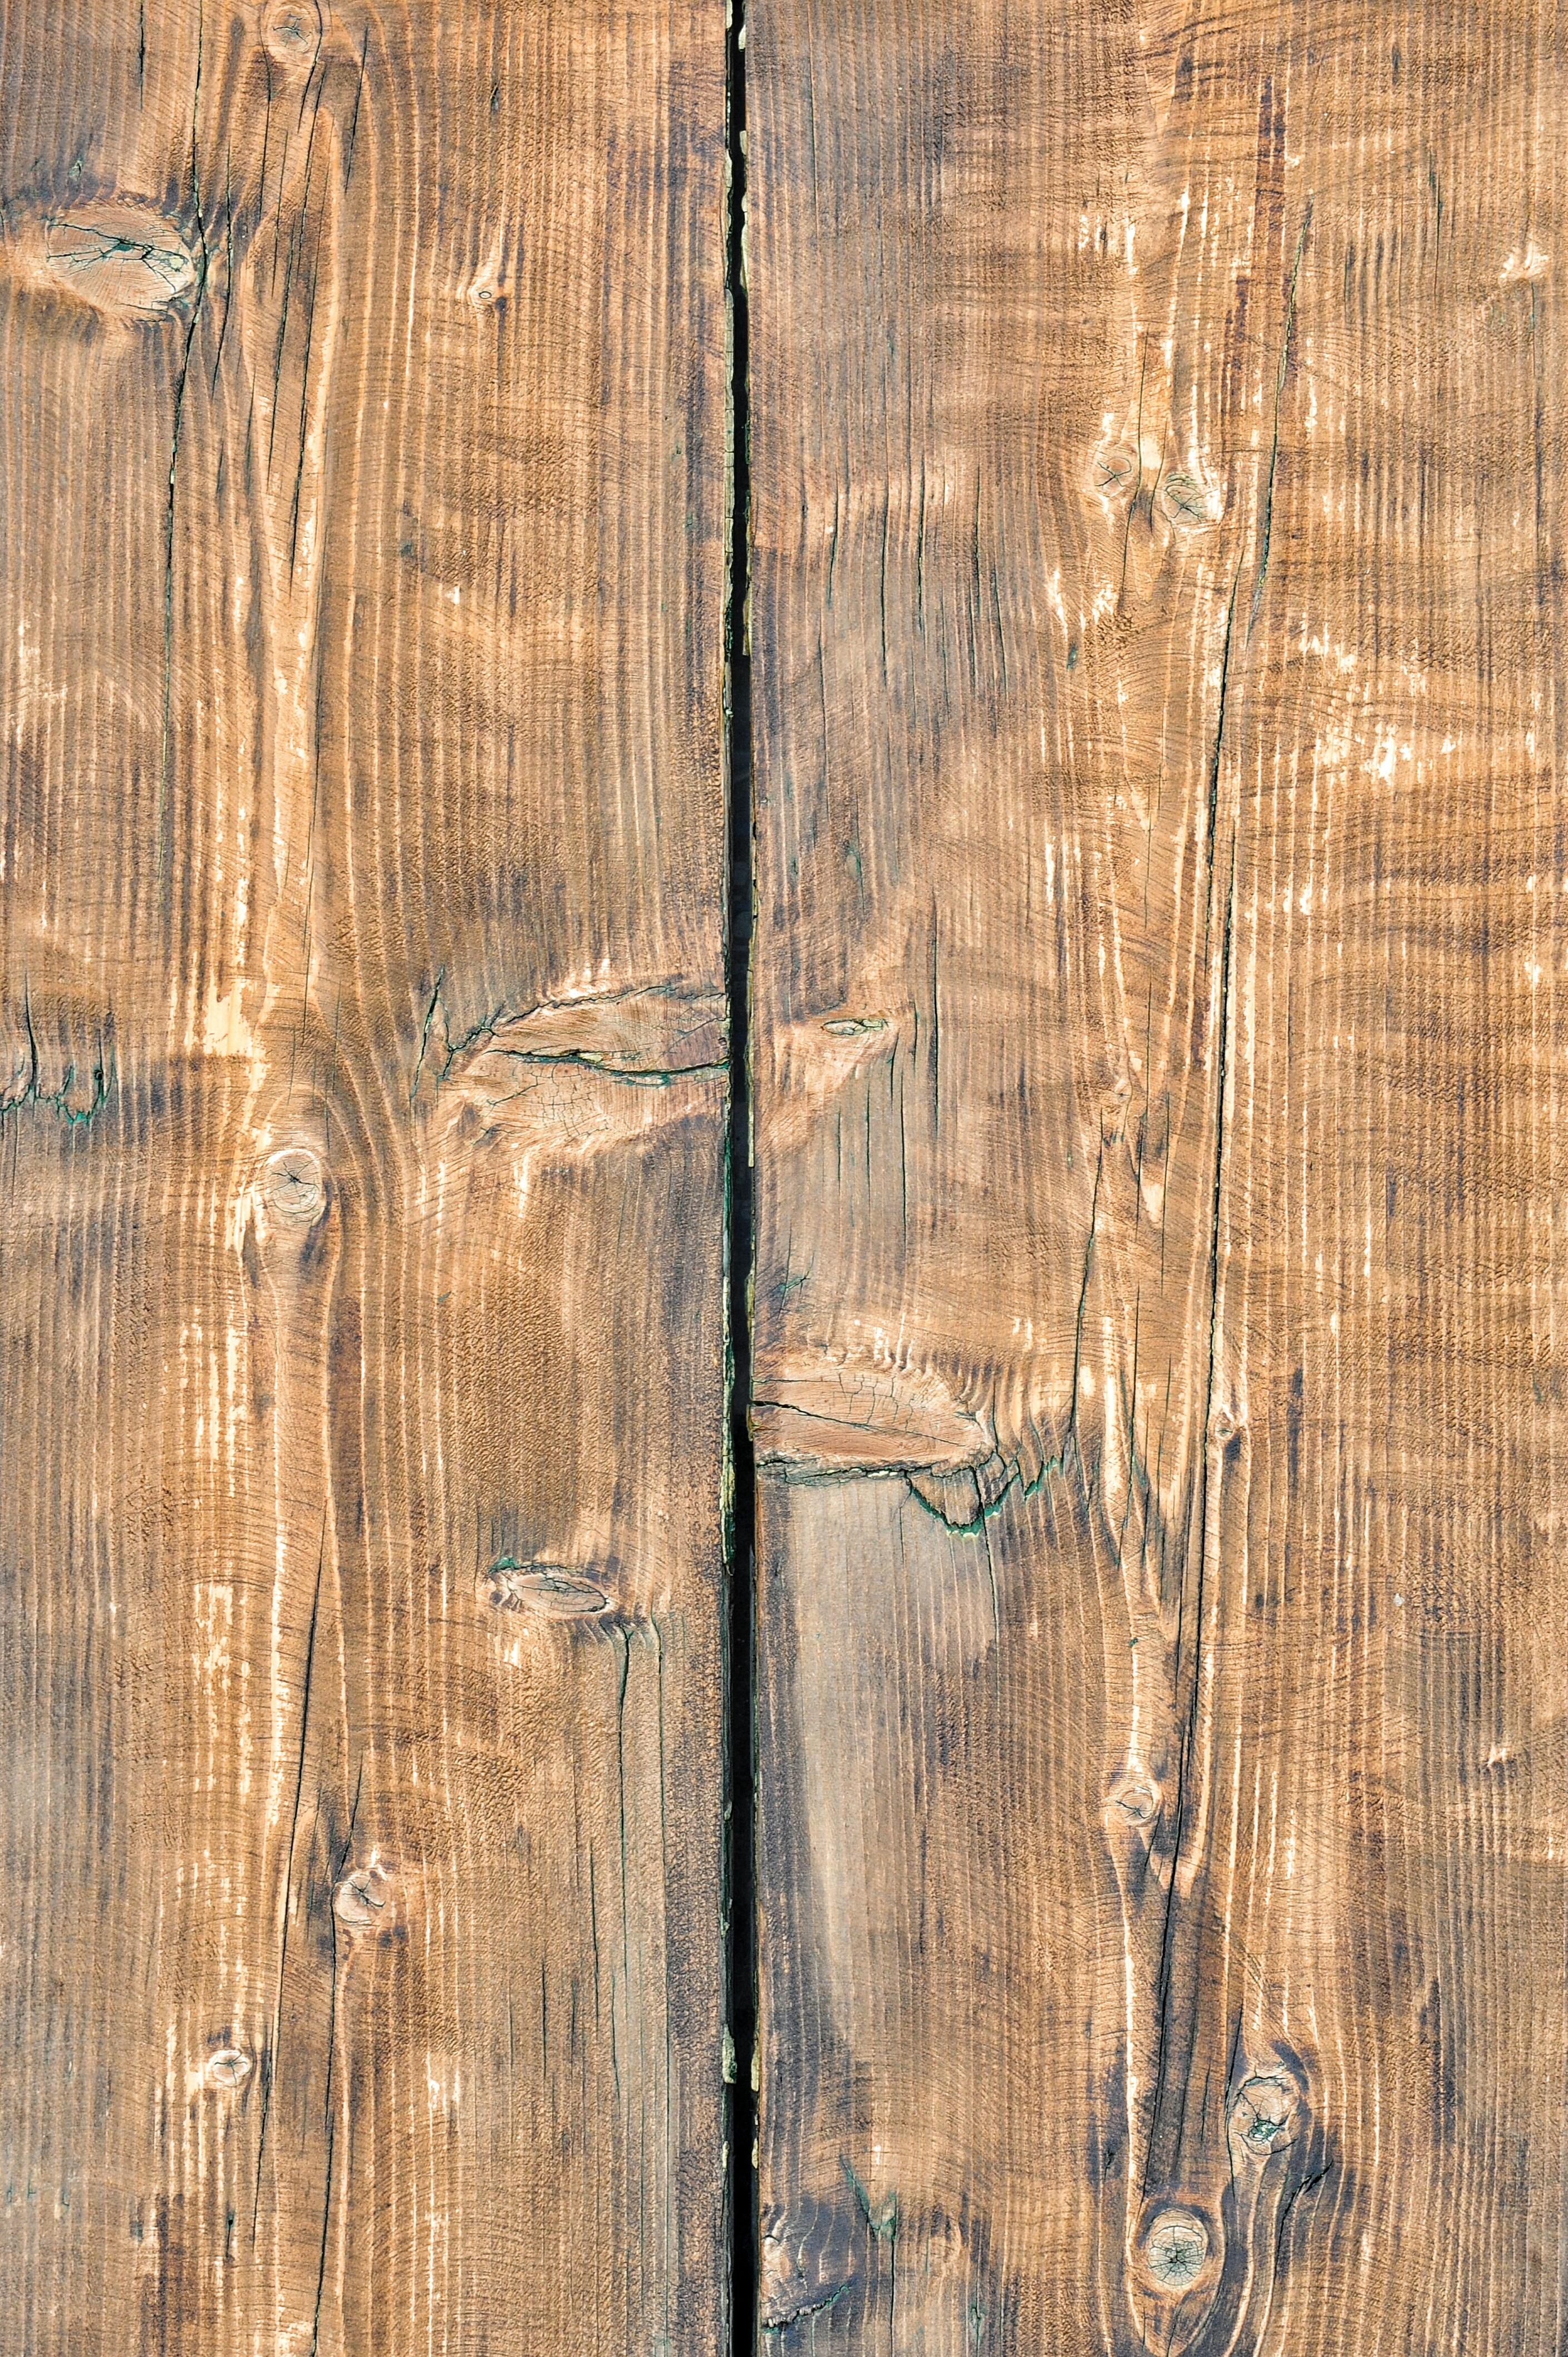 Kostenlose foto : Holz, Textur, Stock, Fenster, Mauer, Muster, Farbe ...